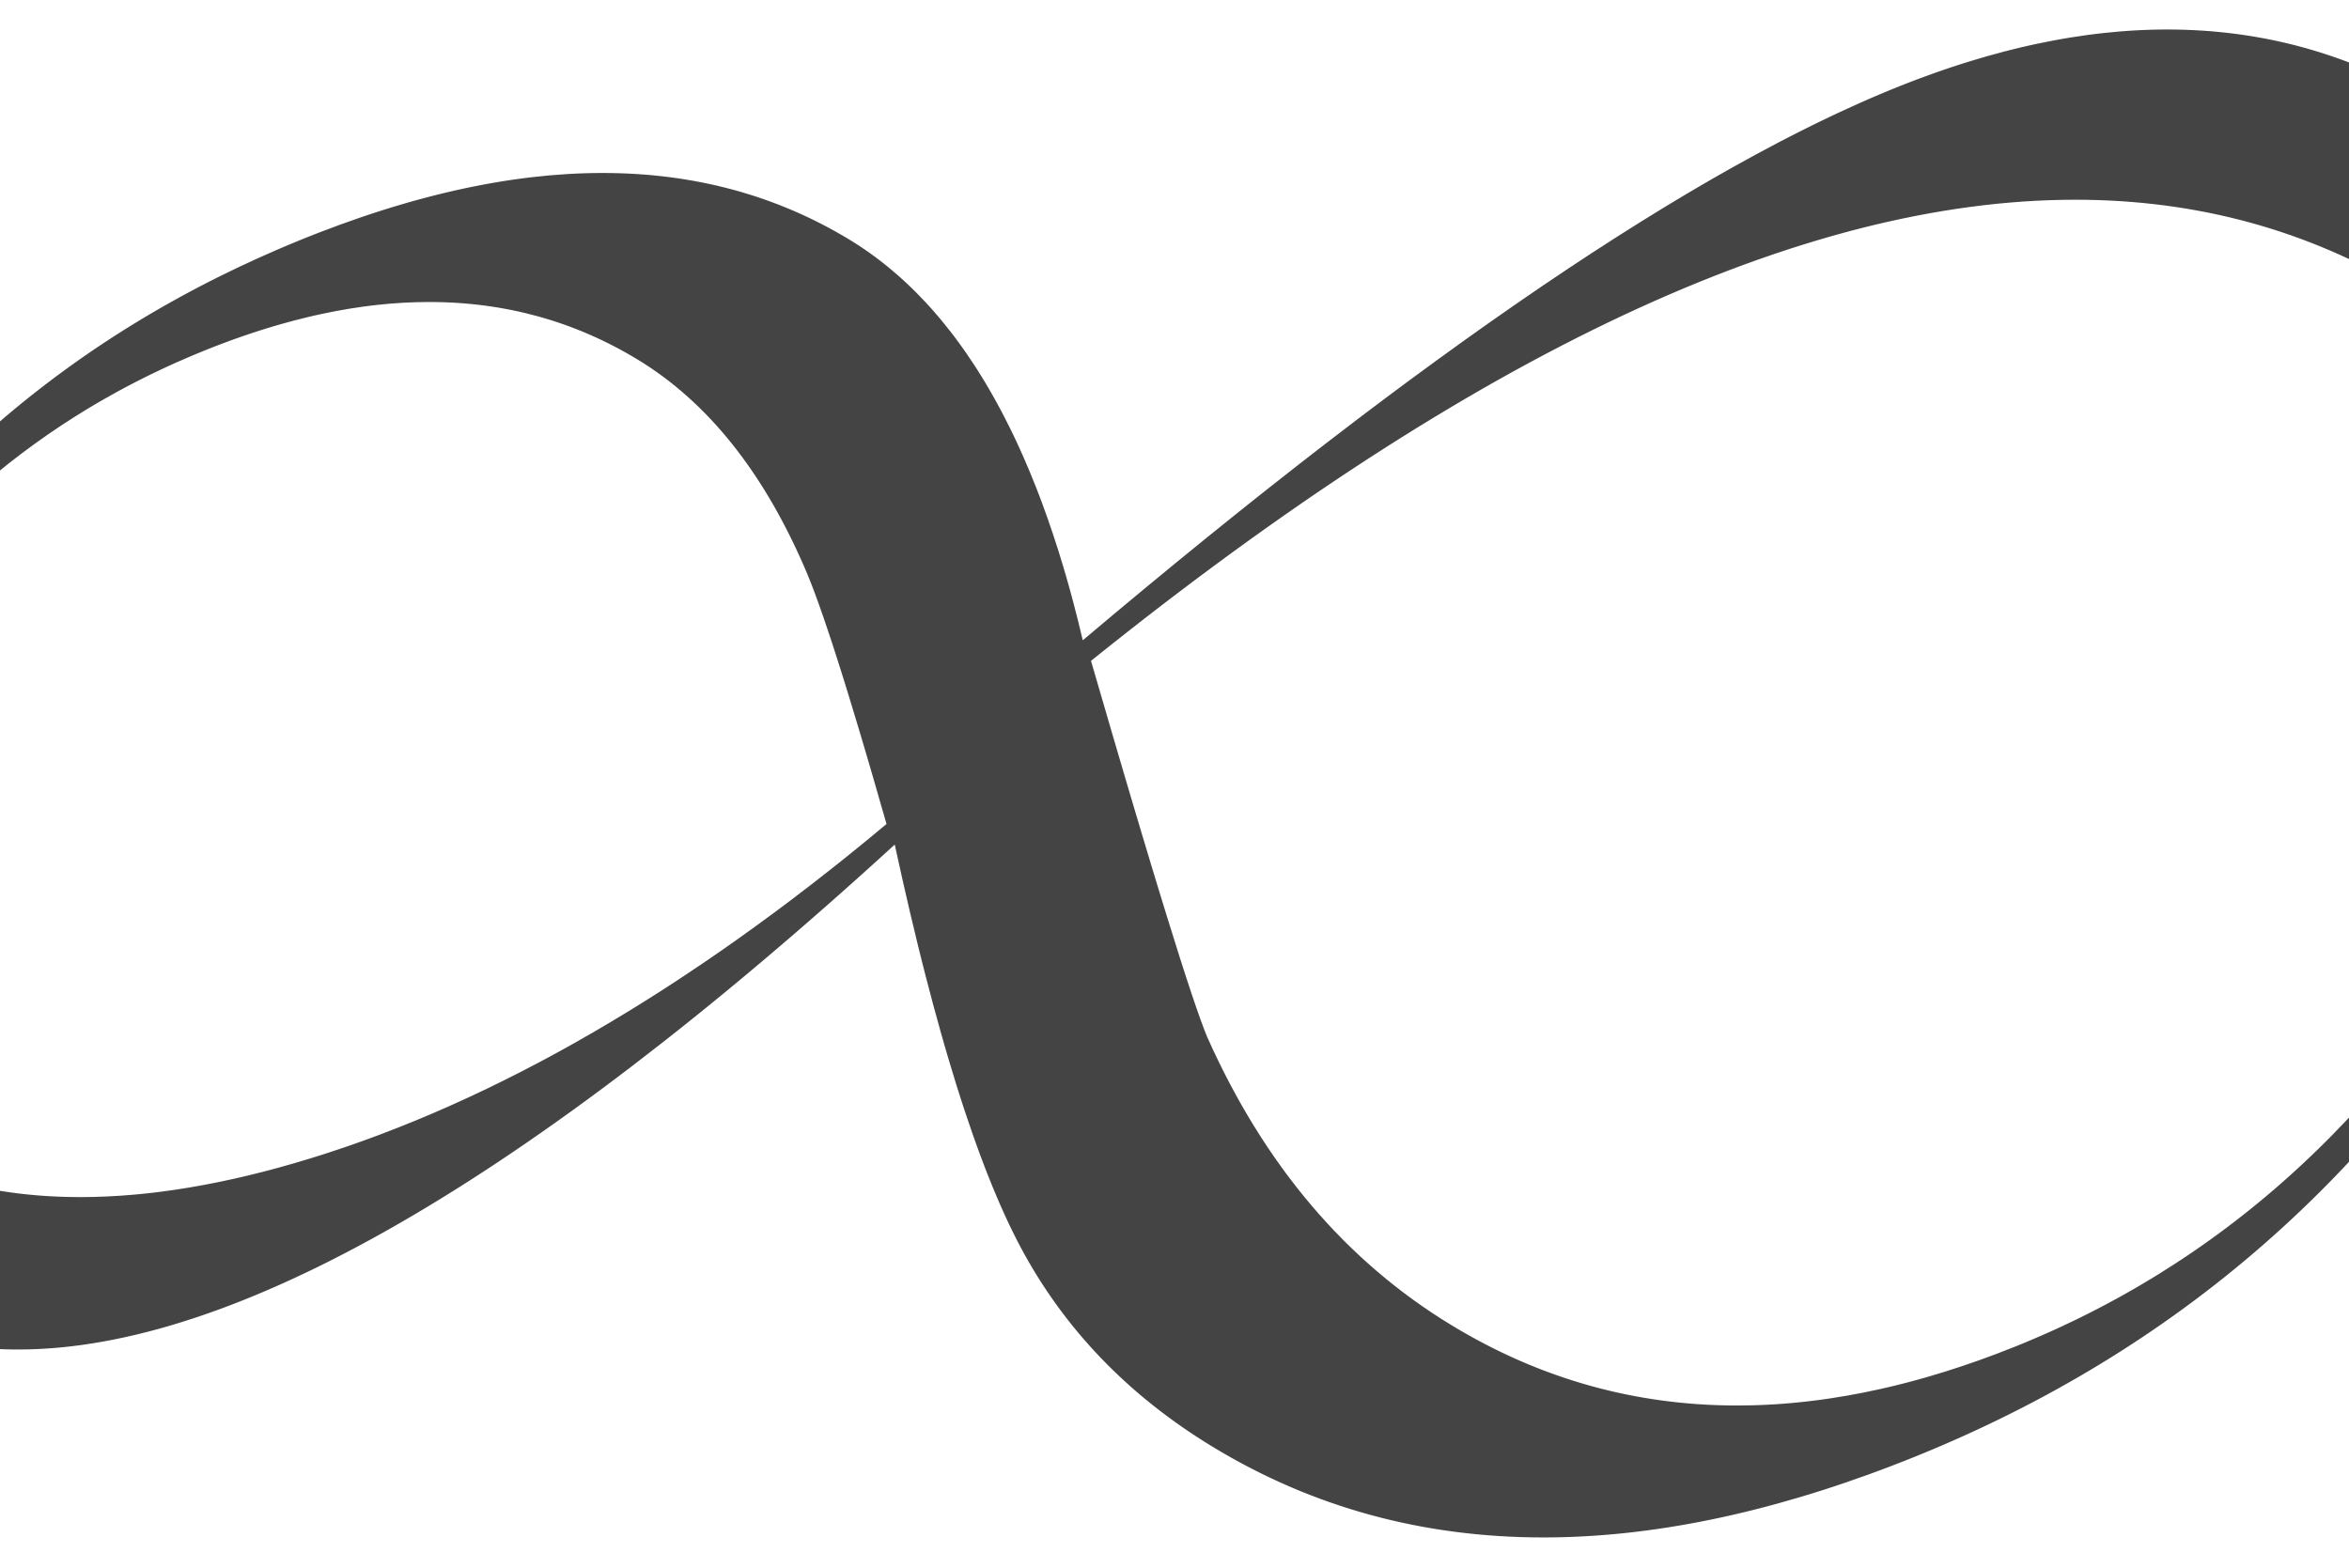 pin Infinity clipart infiniti #8 - Infiniti Logo Eps PNG